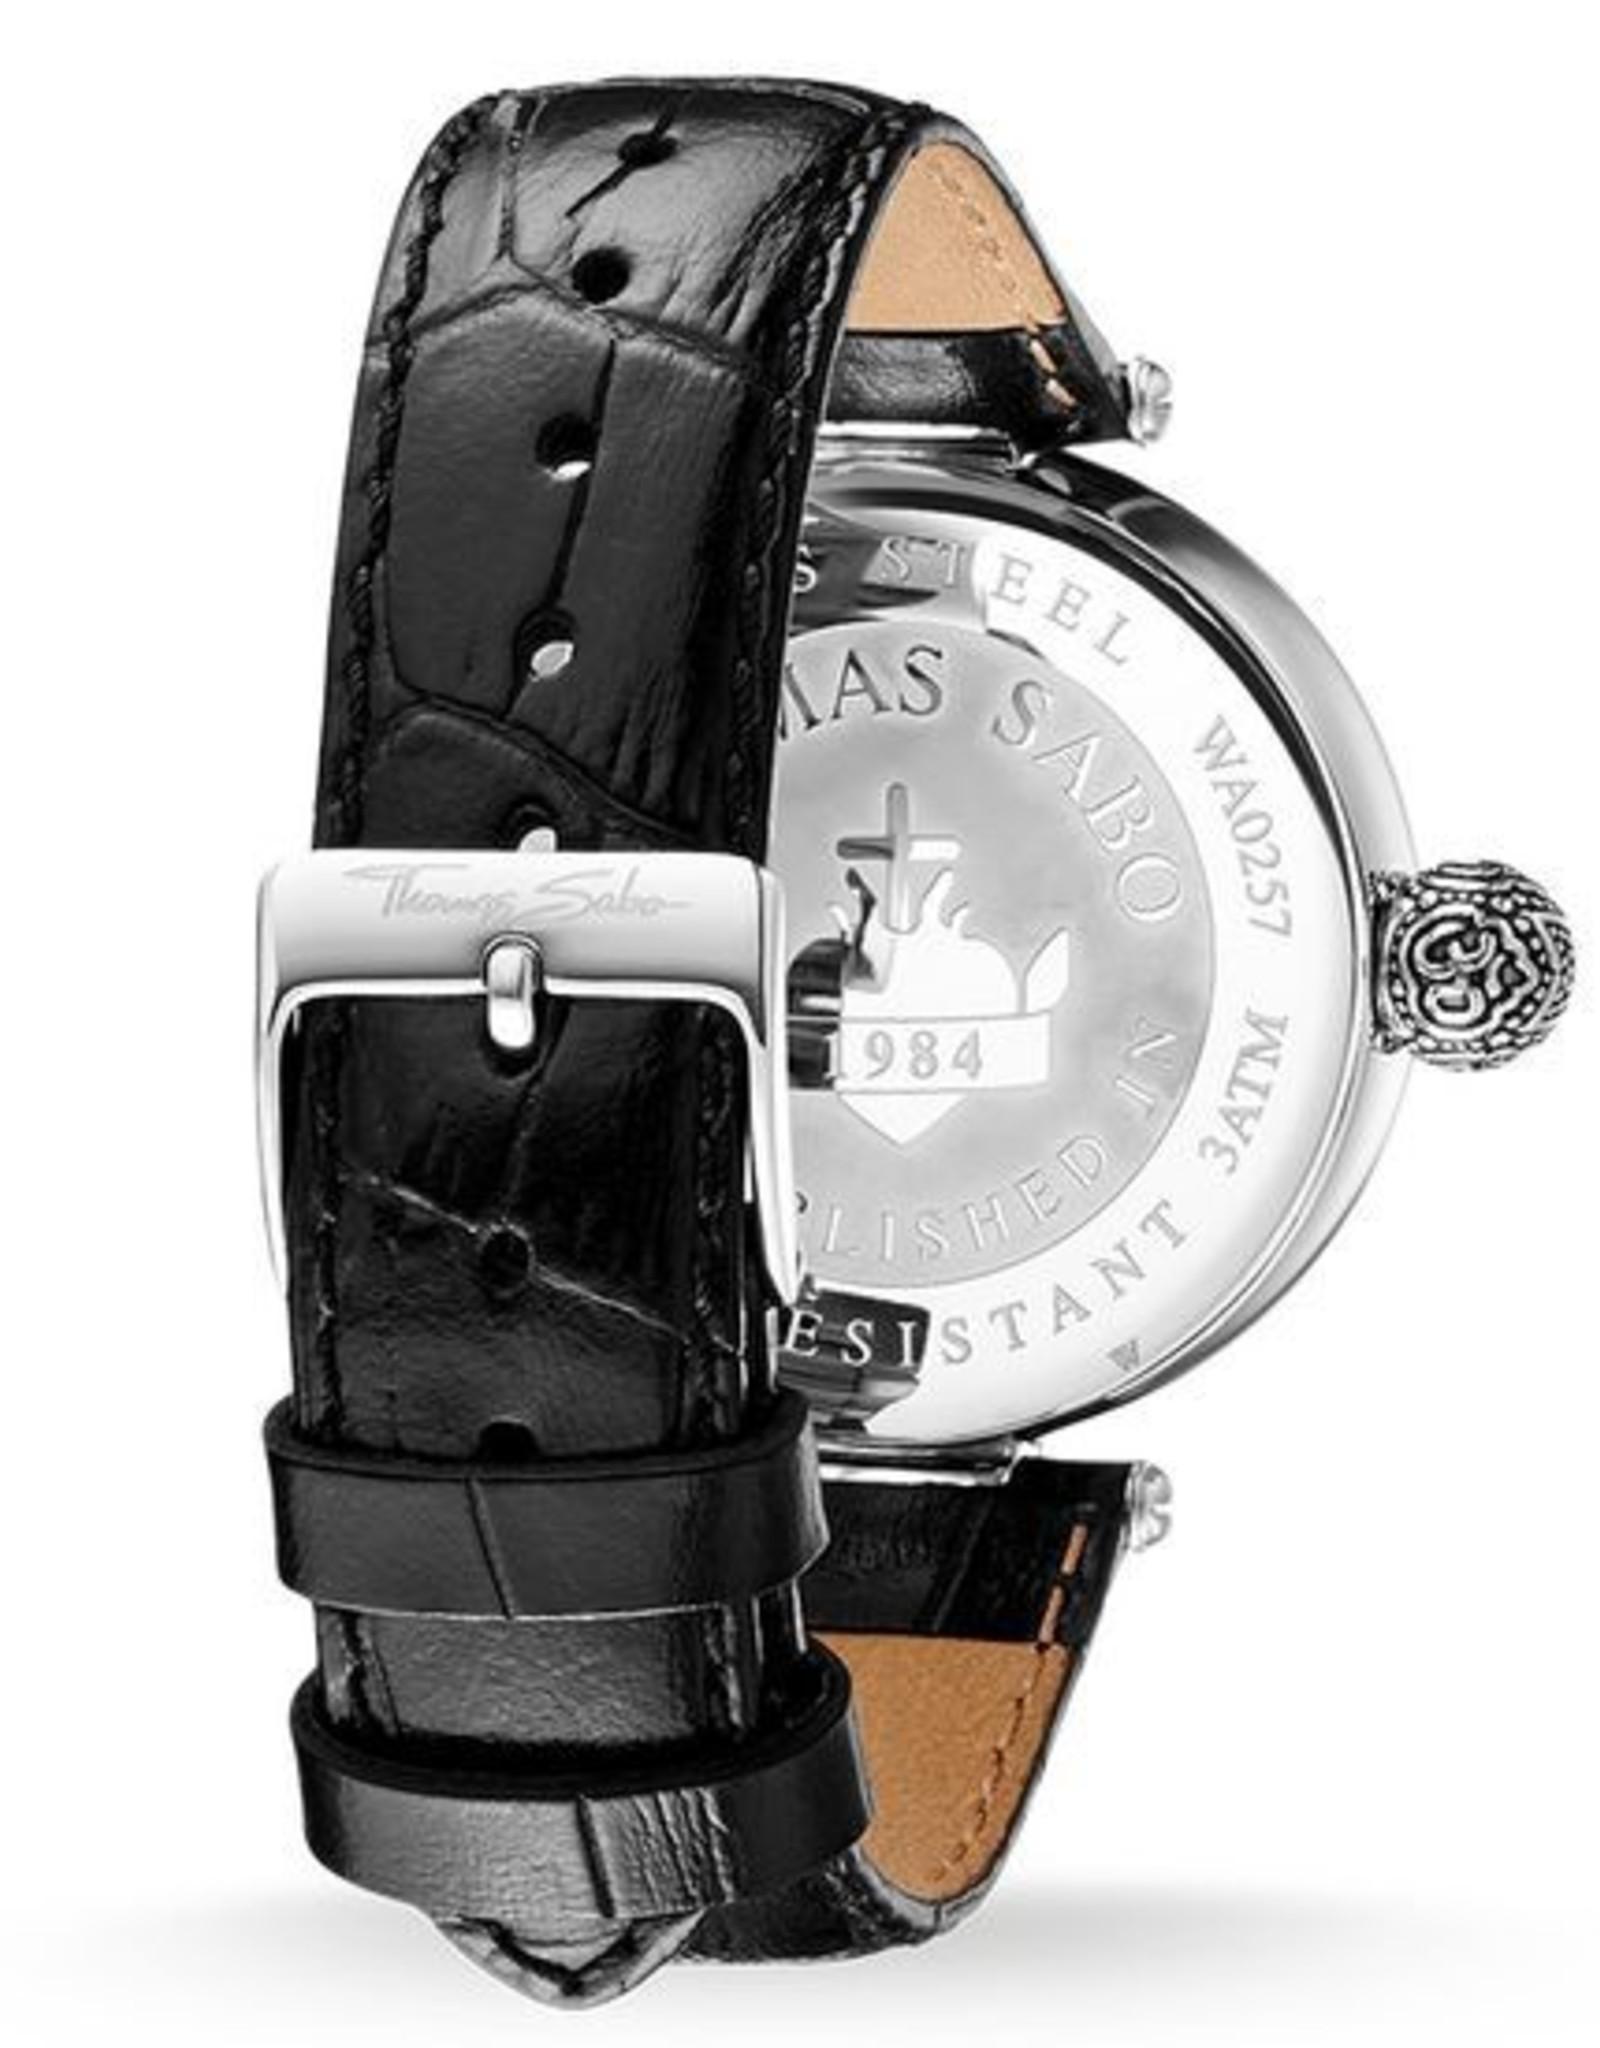 Thomas Sabo Black Leather Strap Black Dial Watch